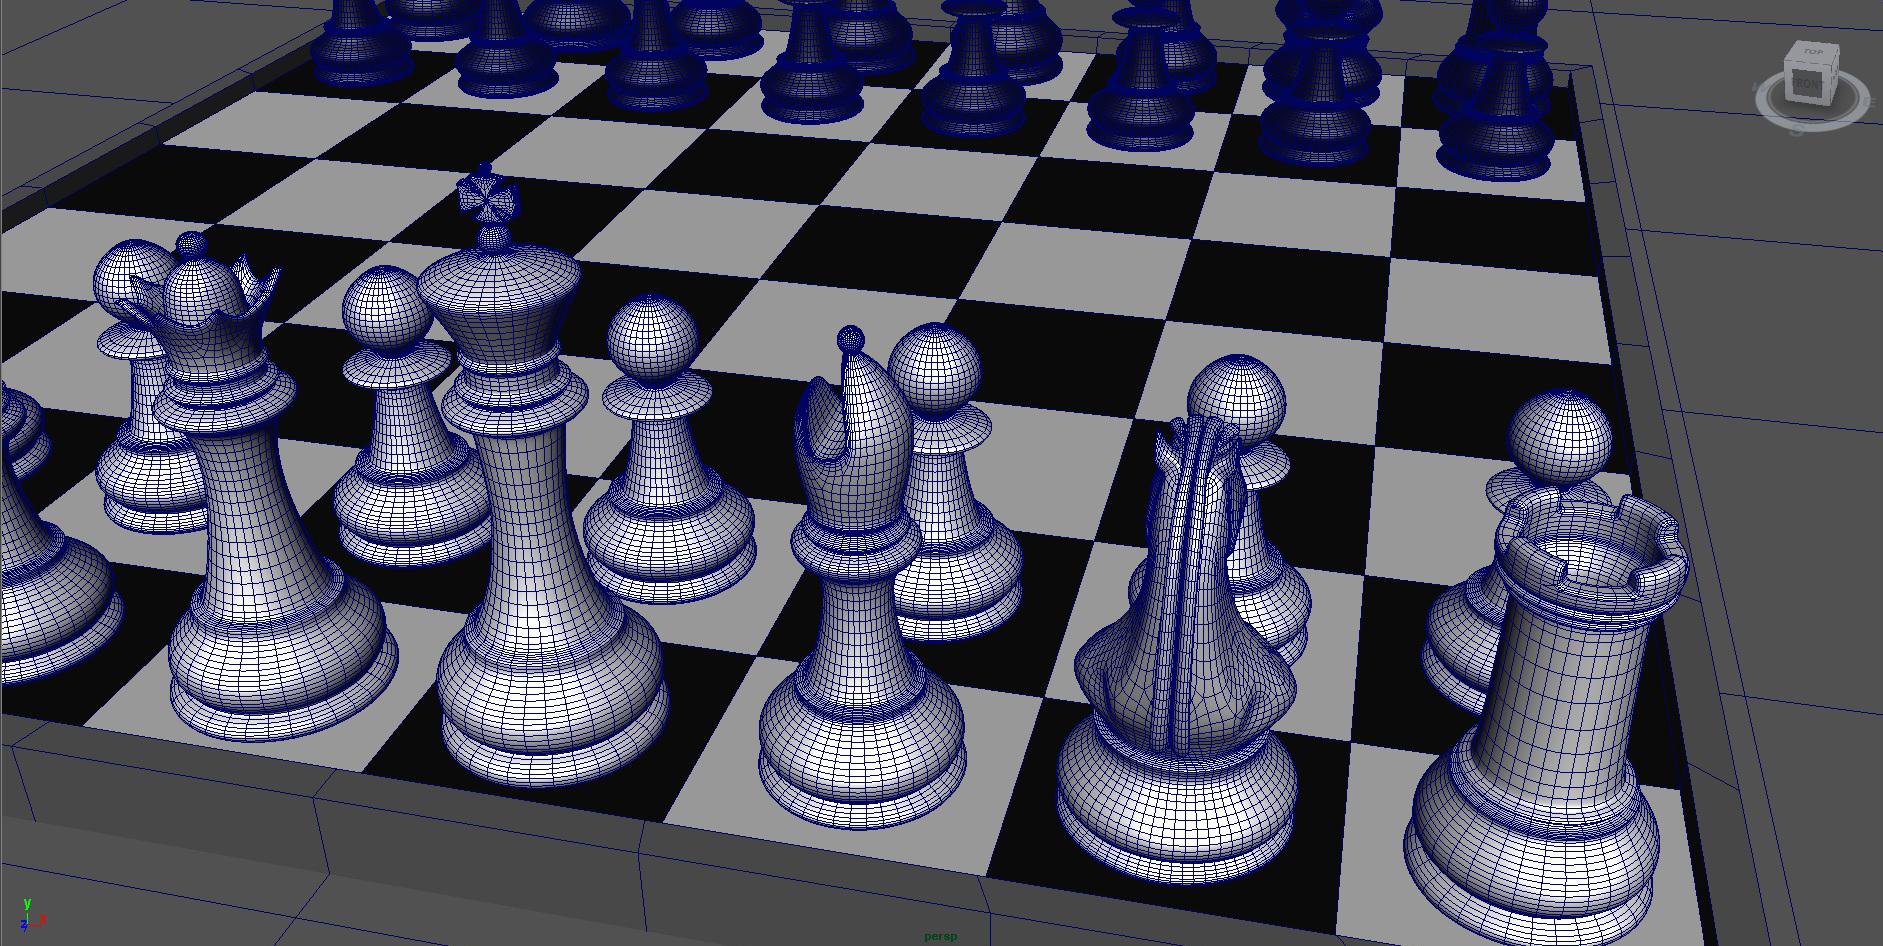 chess 3 3d model fbx ma mb obj 153541